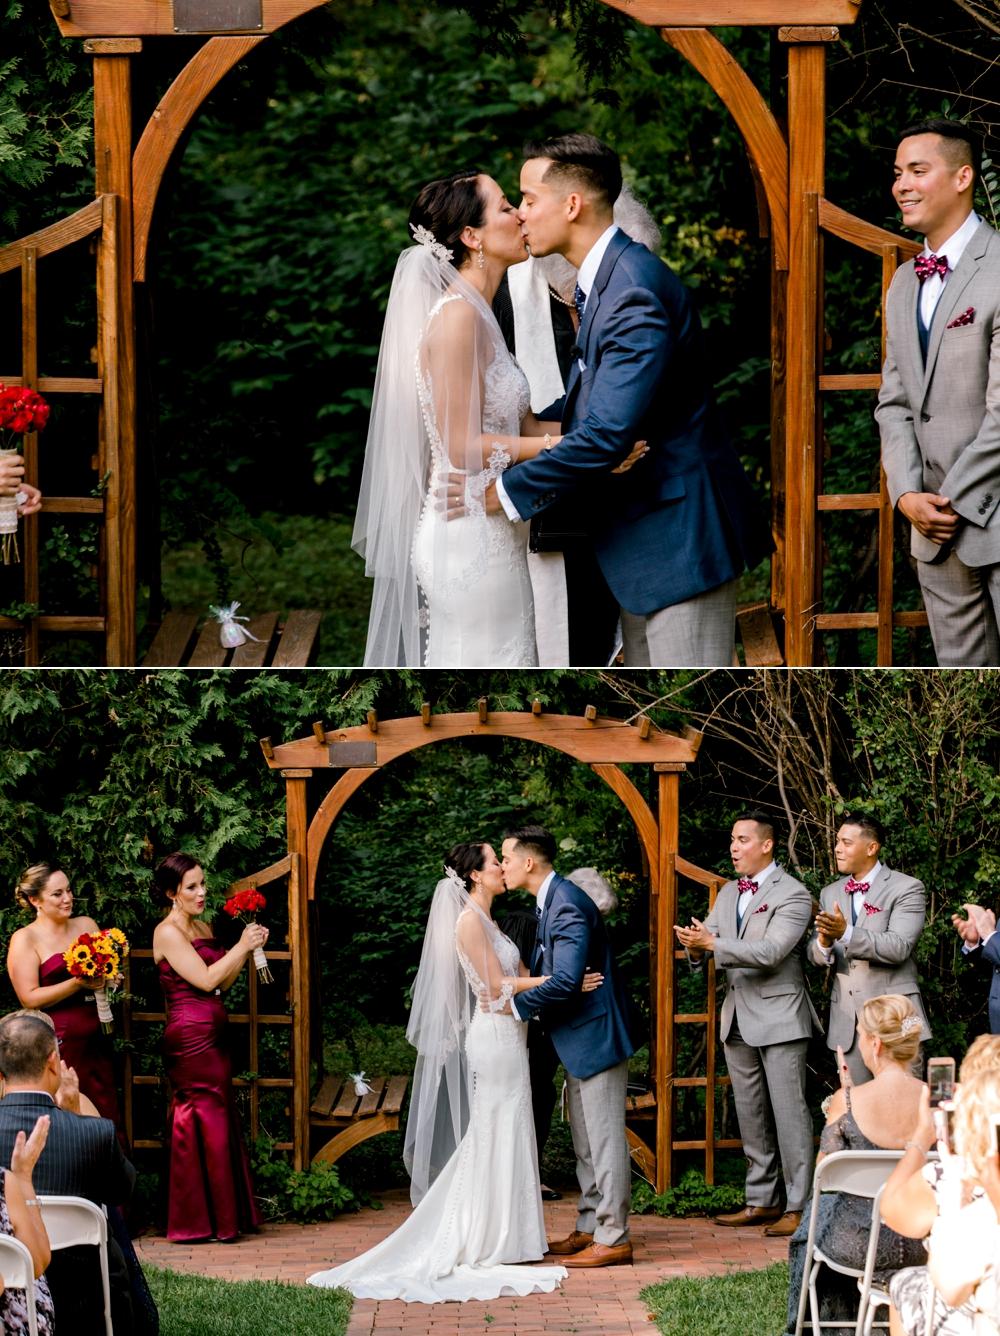 SomerbyJonesPhotography__SmithBarnWedding_SmithBarn_WeddingatSmithBarn_0028.jpg